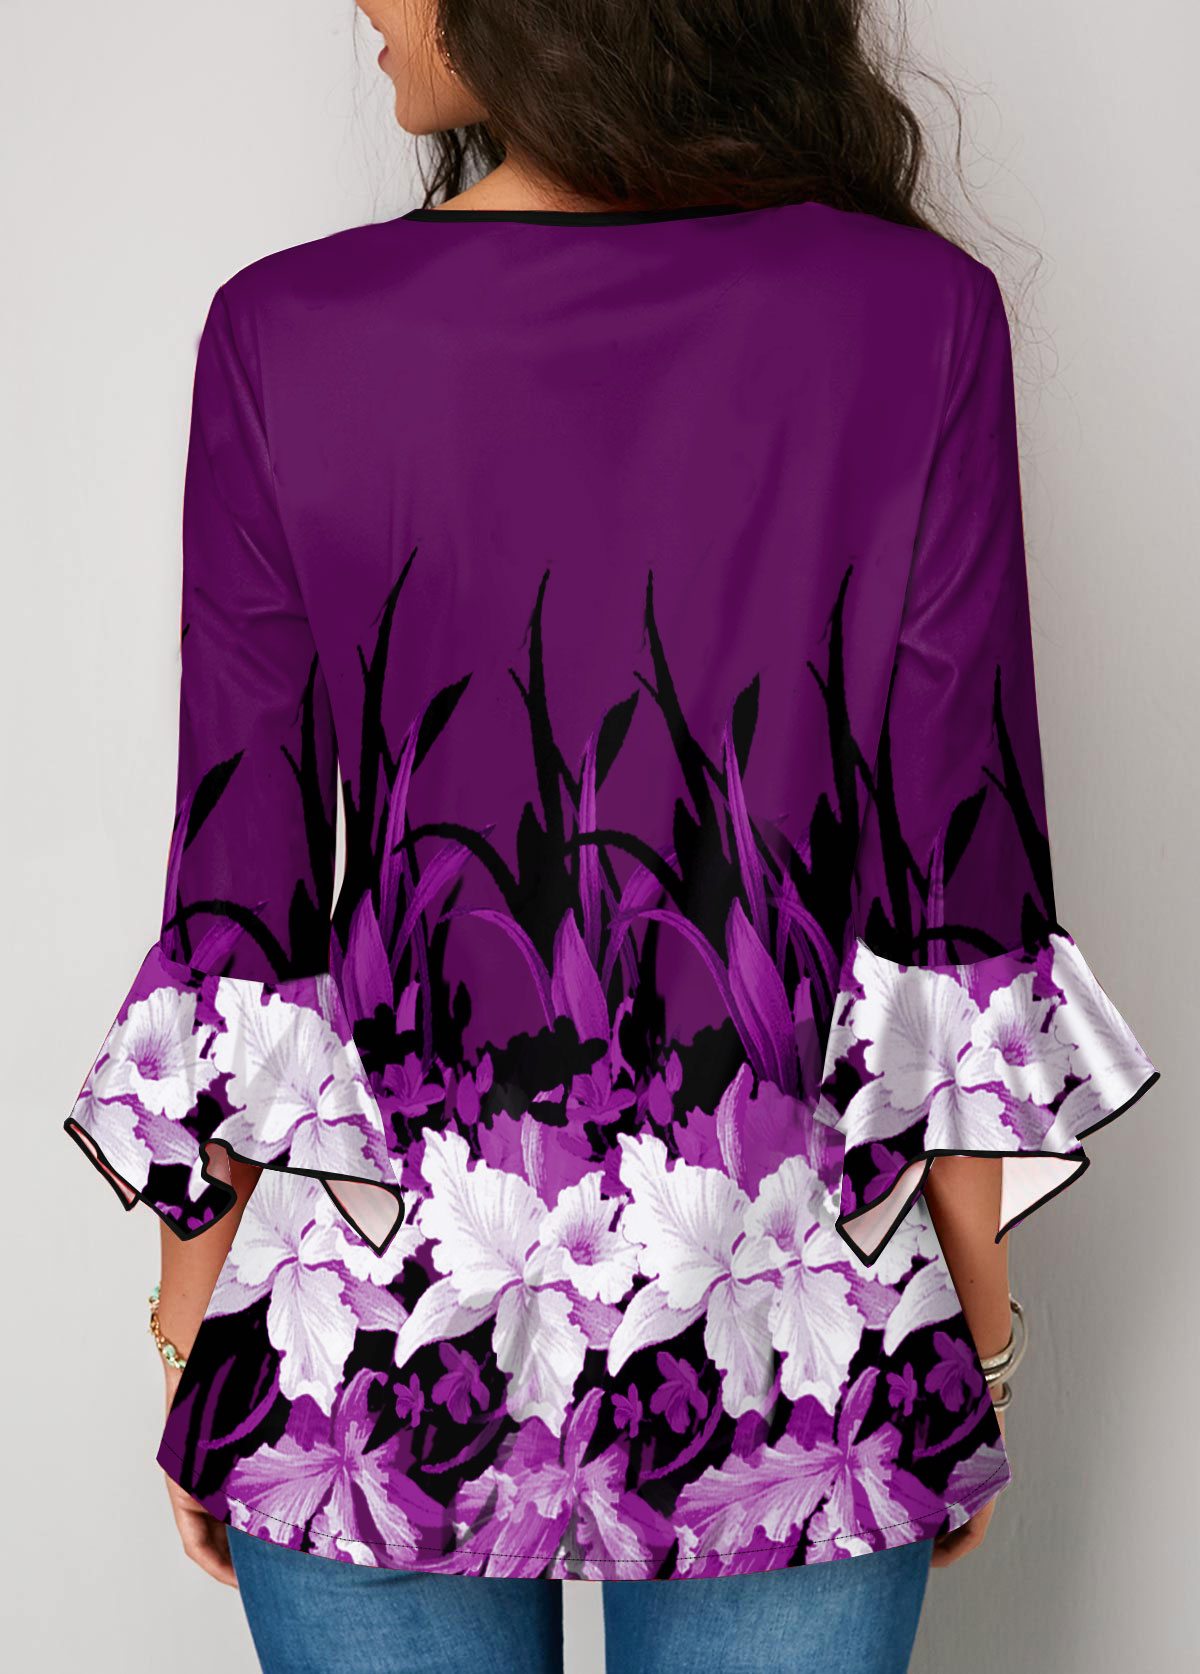 Purple Round Neck Button Up Flower Print Blouse